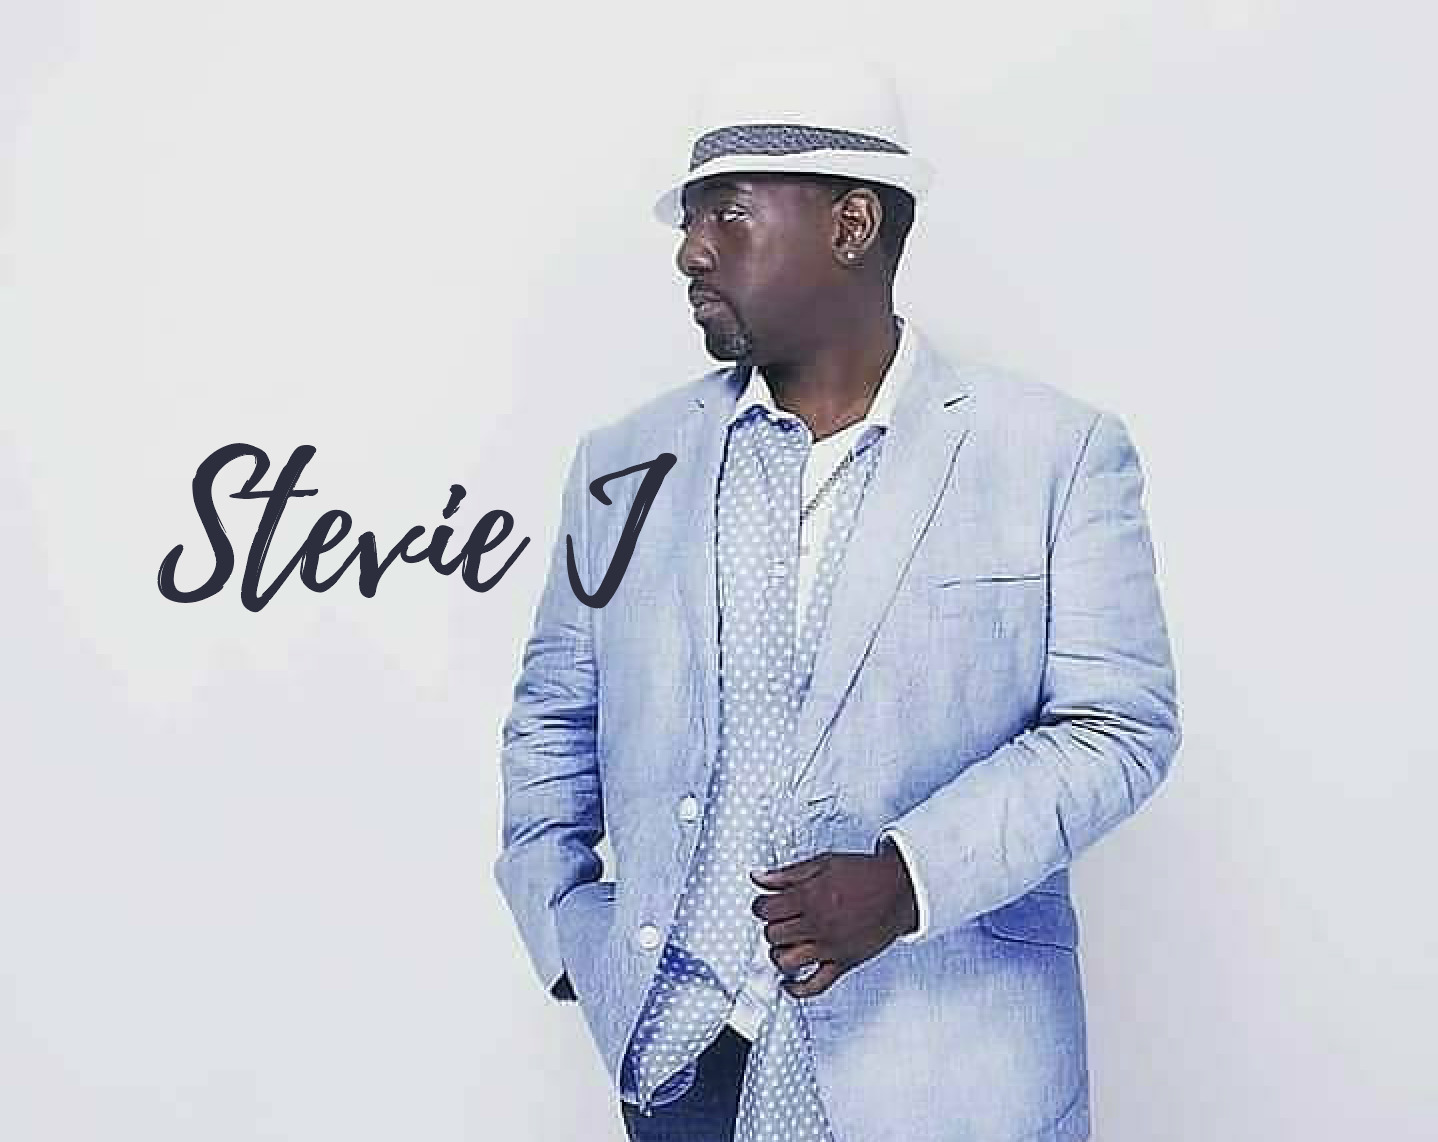 Stevie J at FJC